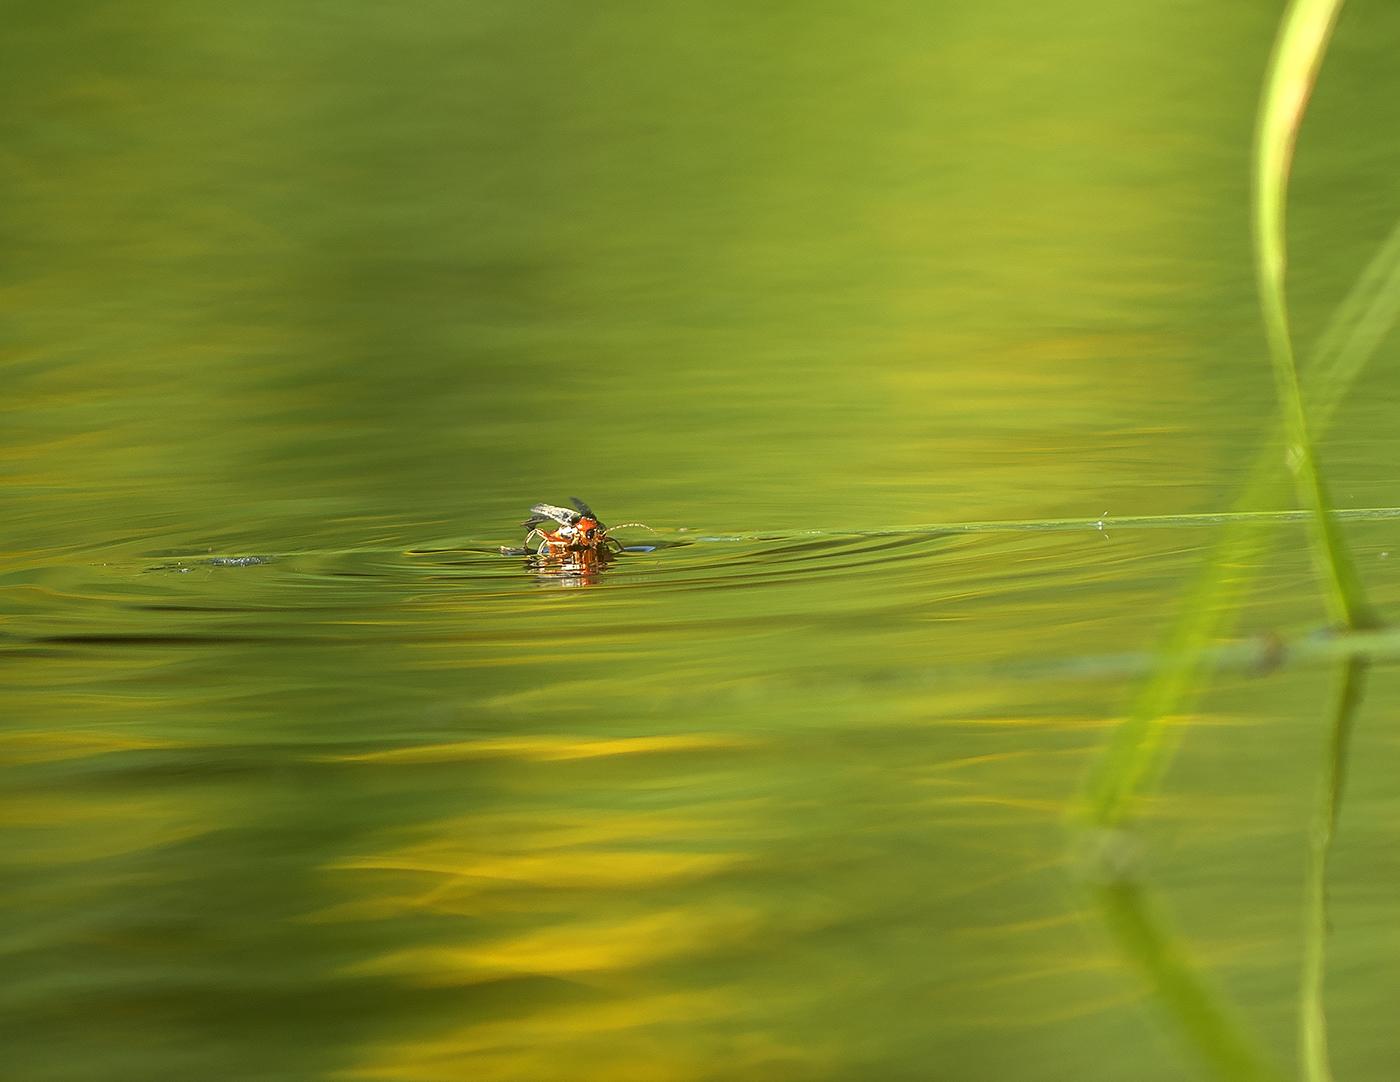 Red Beetle - Ahrex Pond 18-05-01